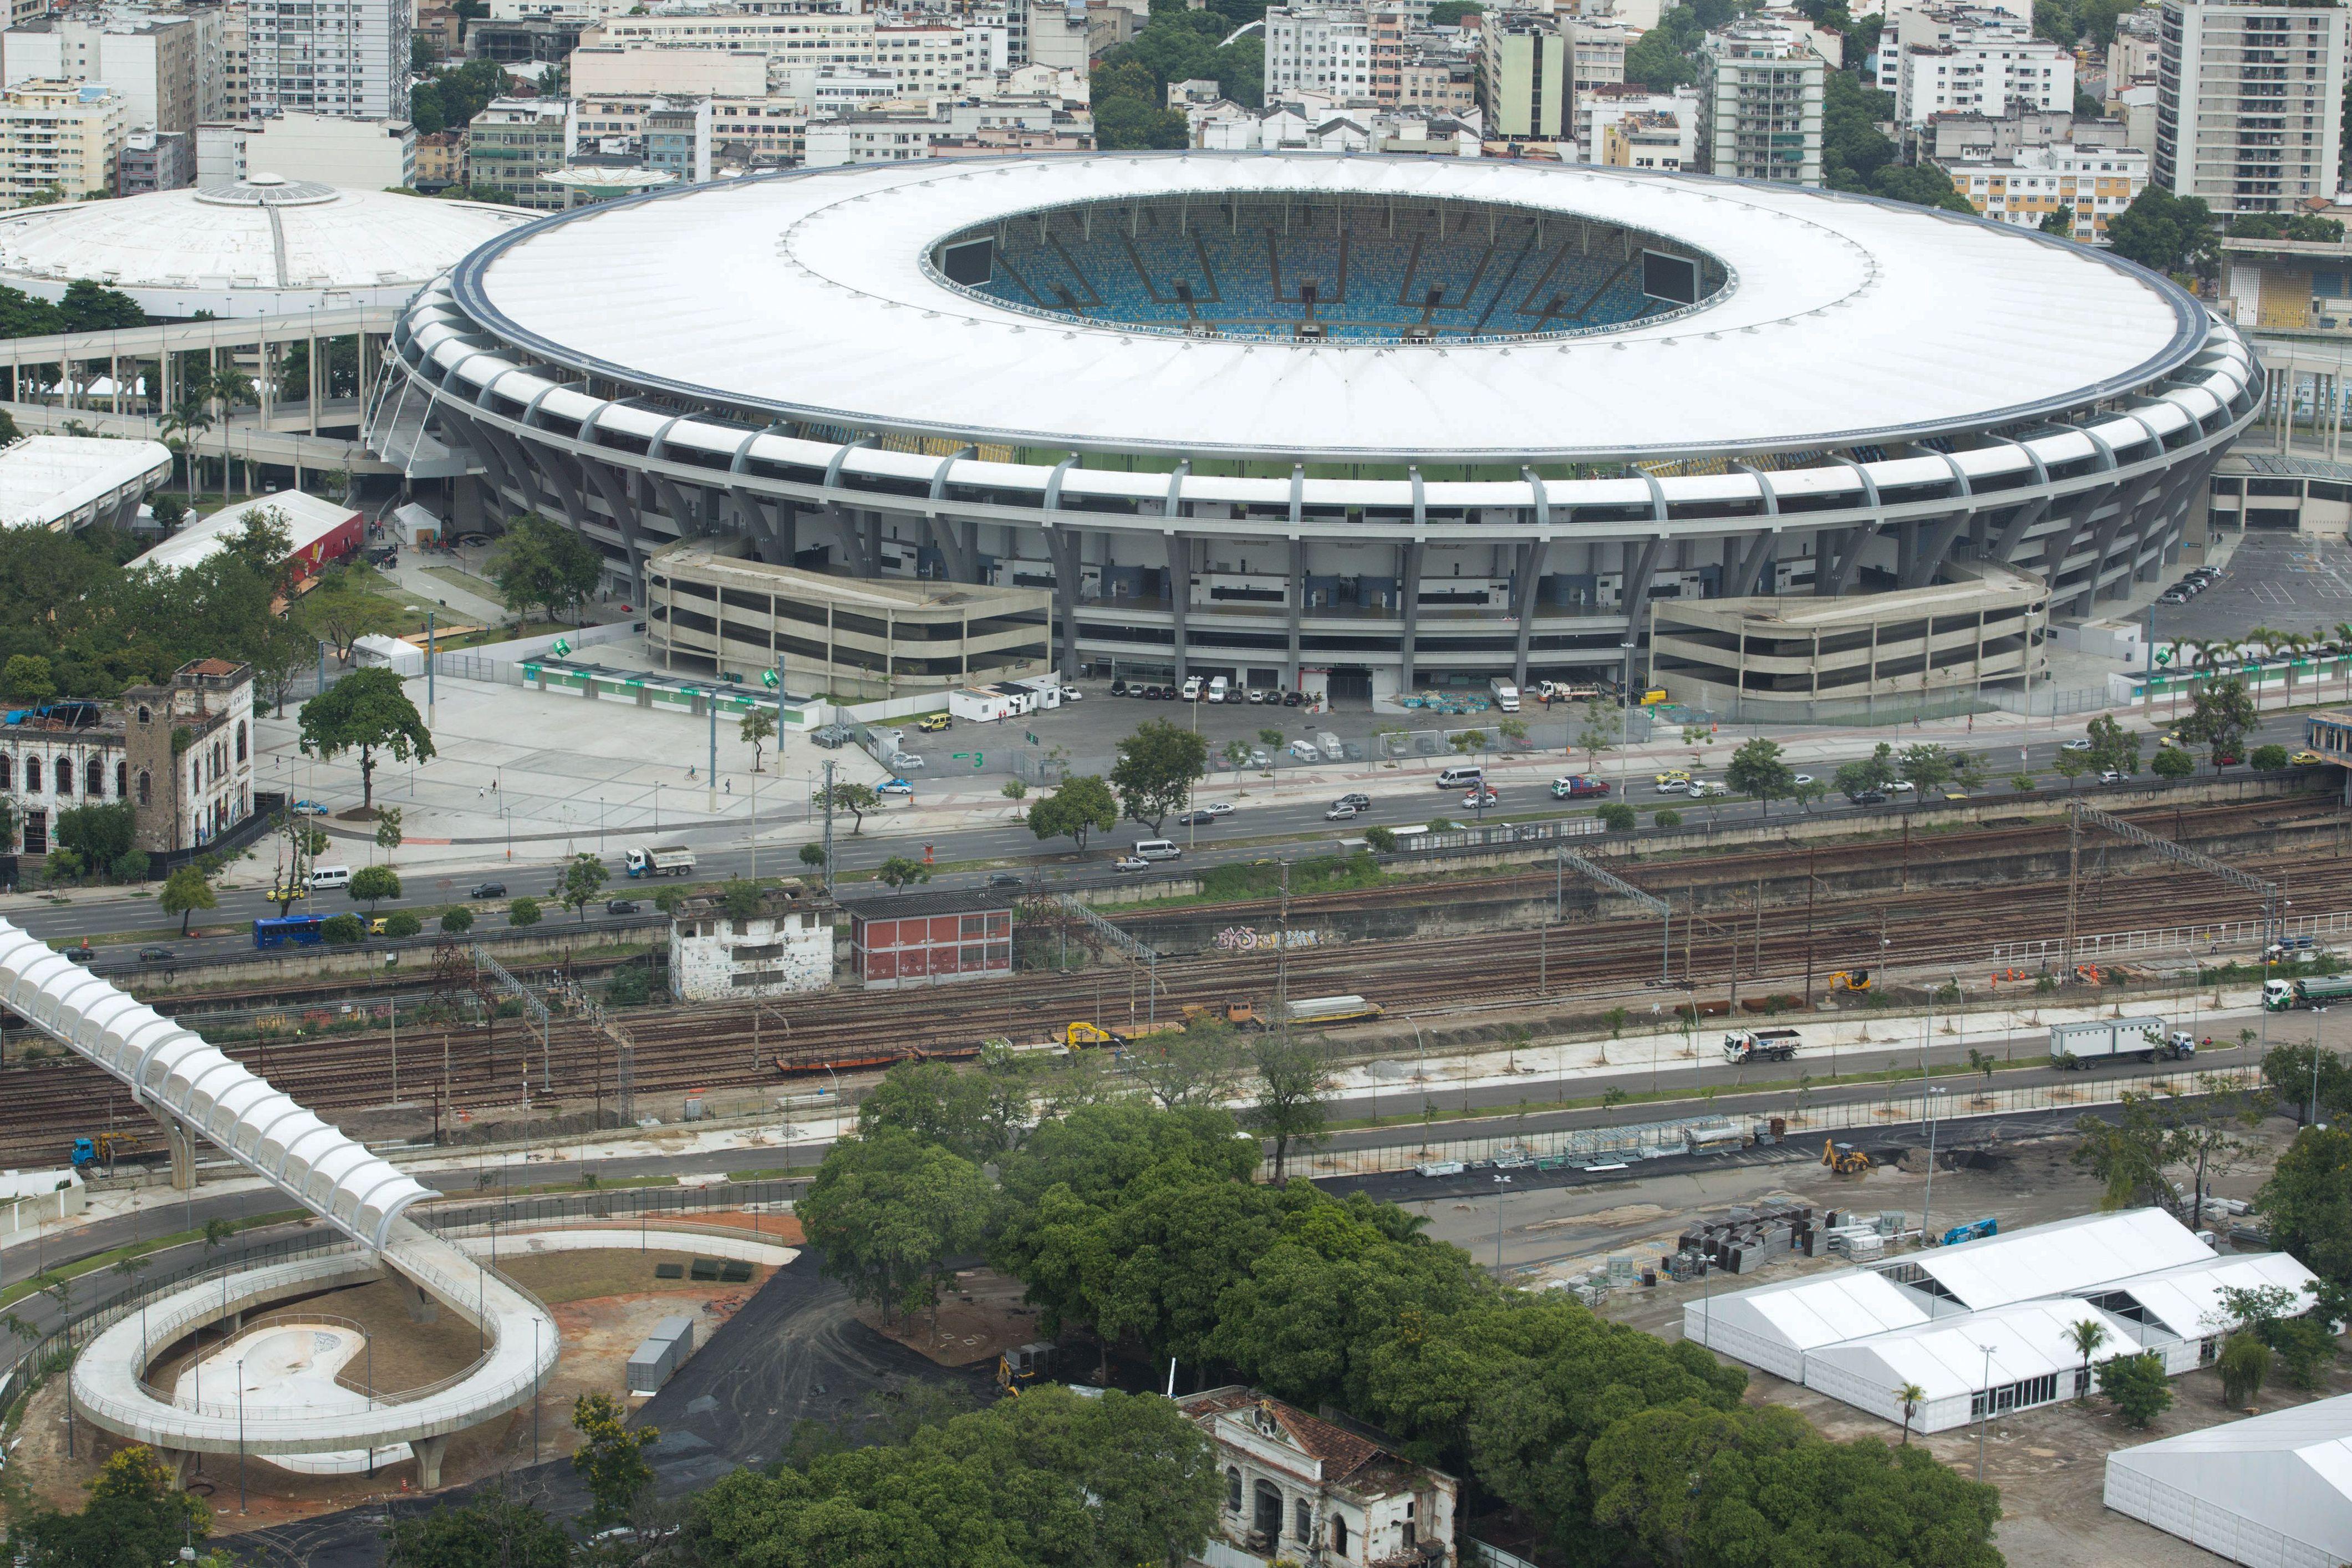 Rio 2016: sorteio define os adversários do Brasil na 1ª fase. Confira ...